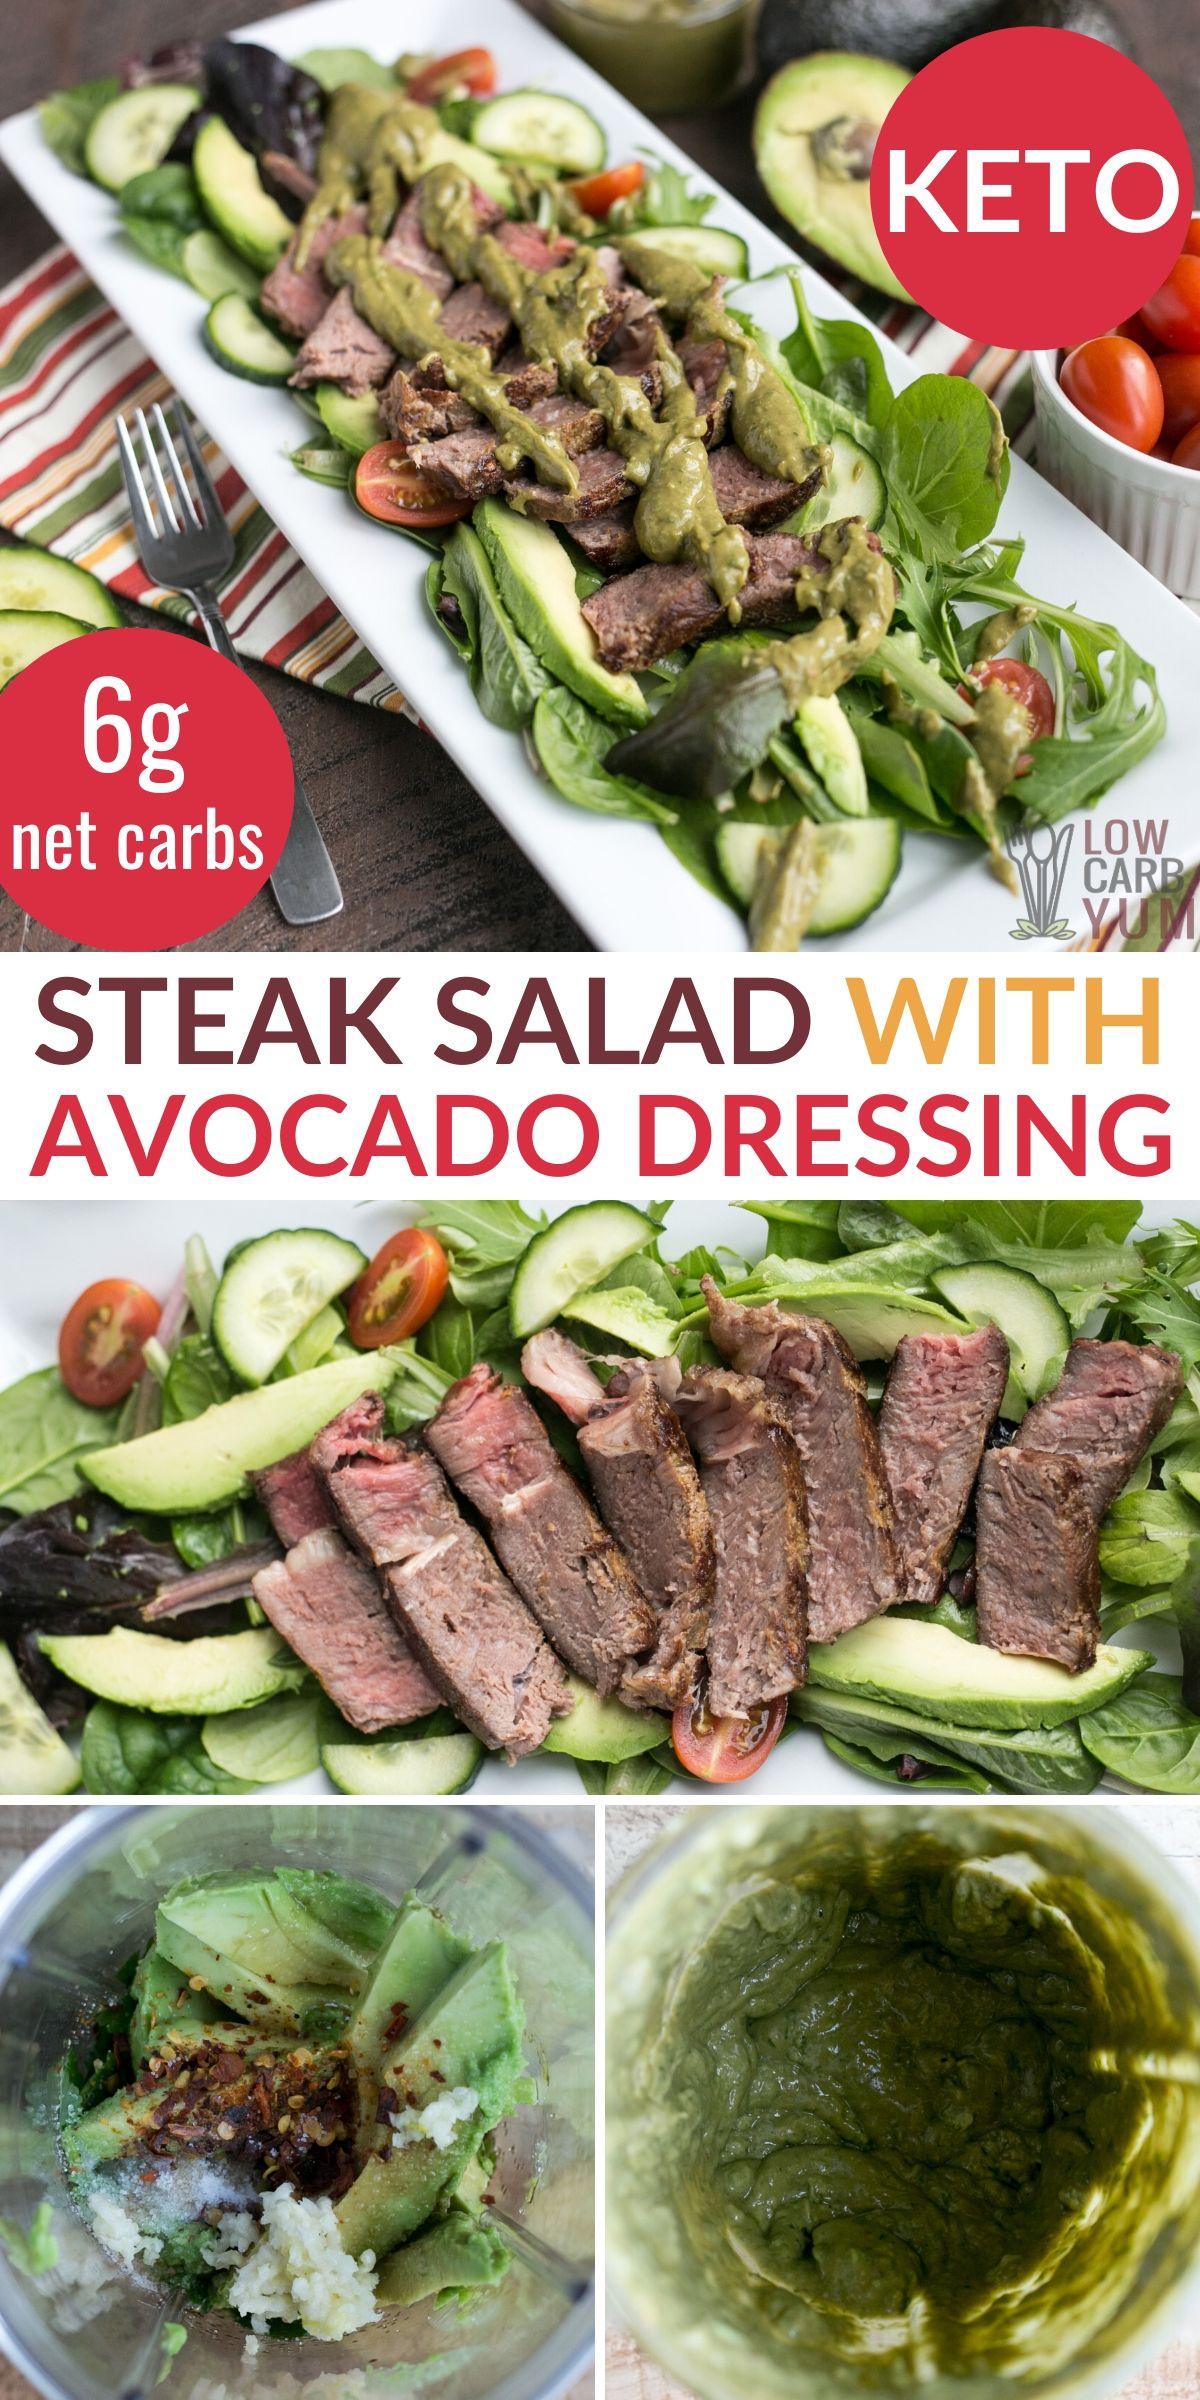 Keto Steak Salad In 2020 Low Carb Salad Steak Salad Beef Recipes